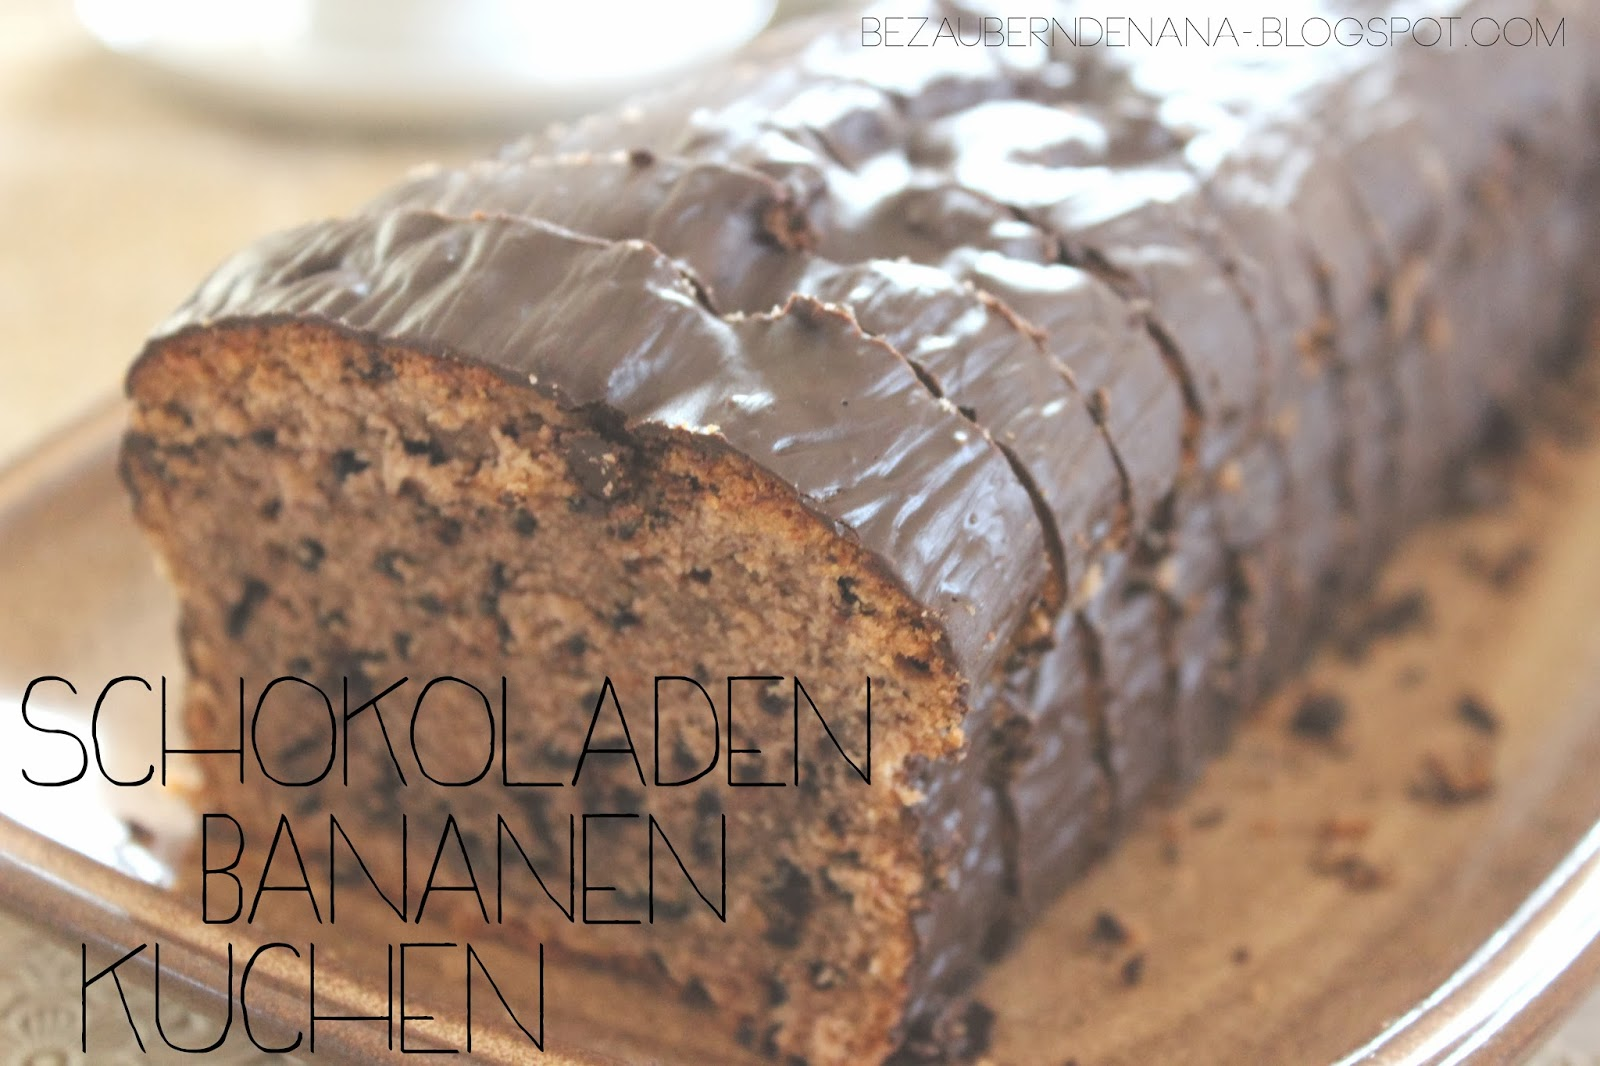 Schokoladen - Bananen Kuchen